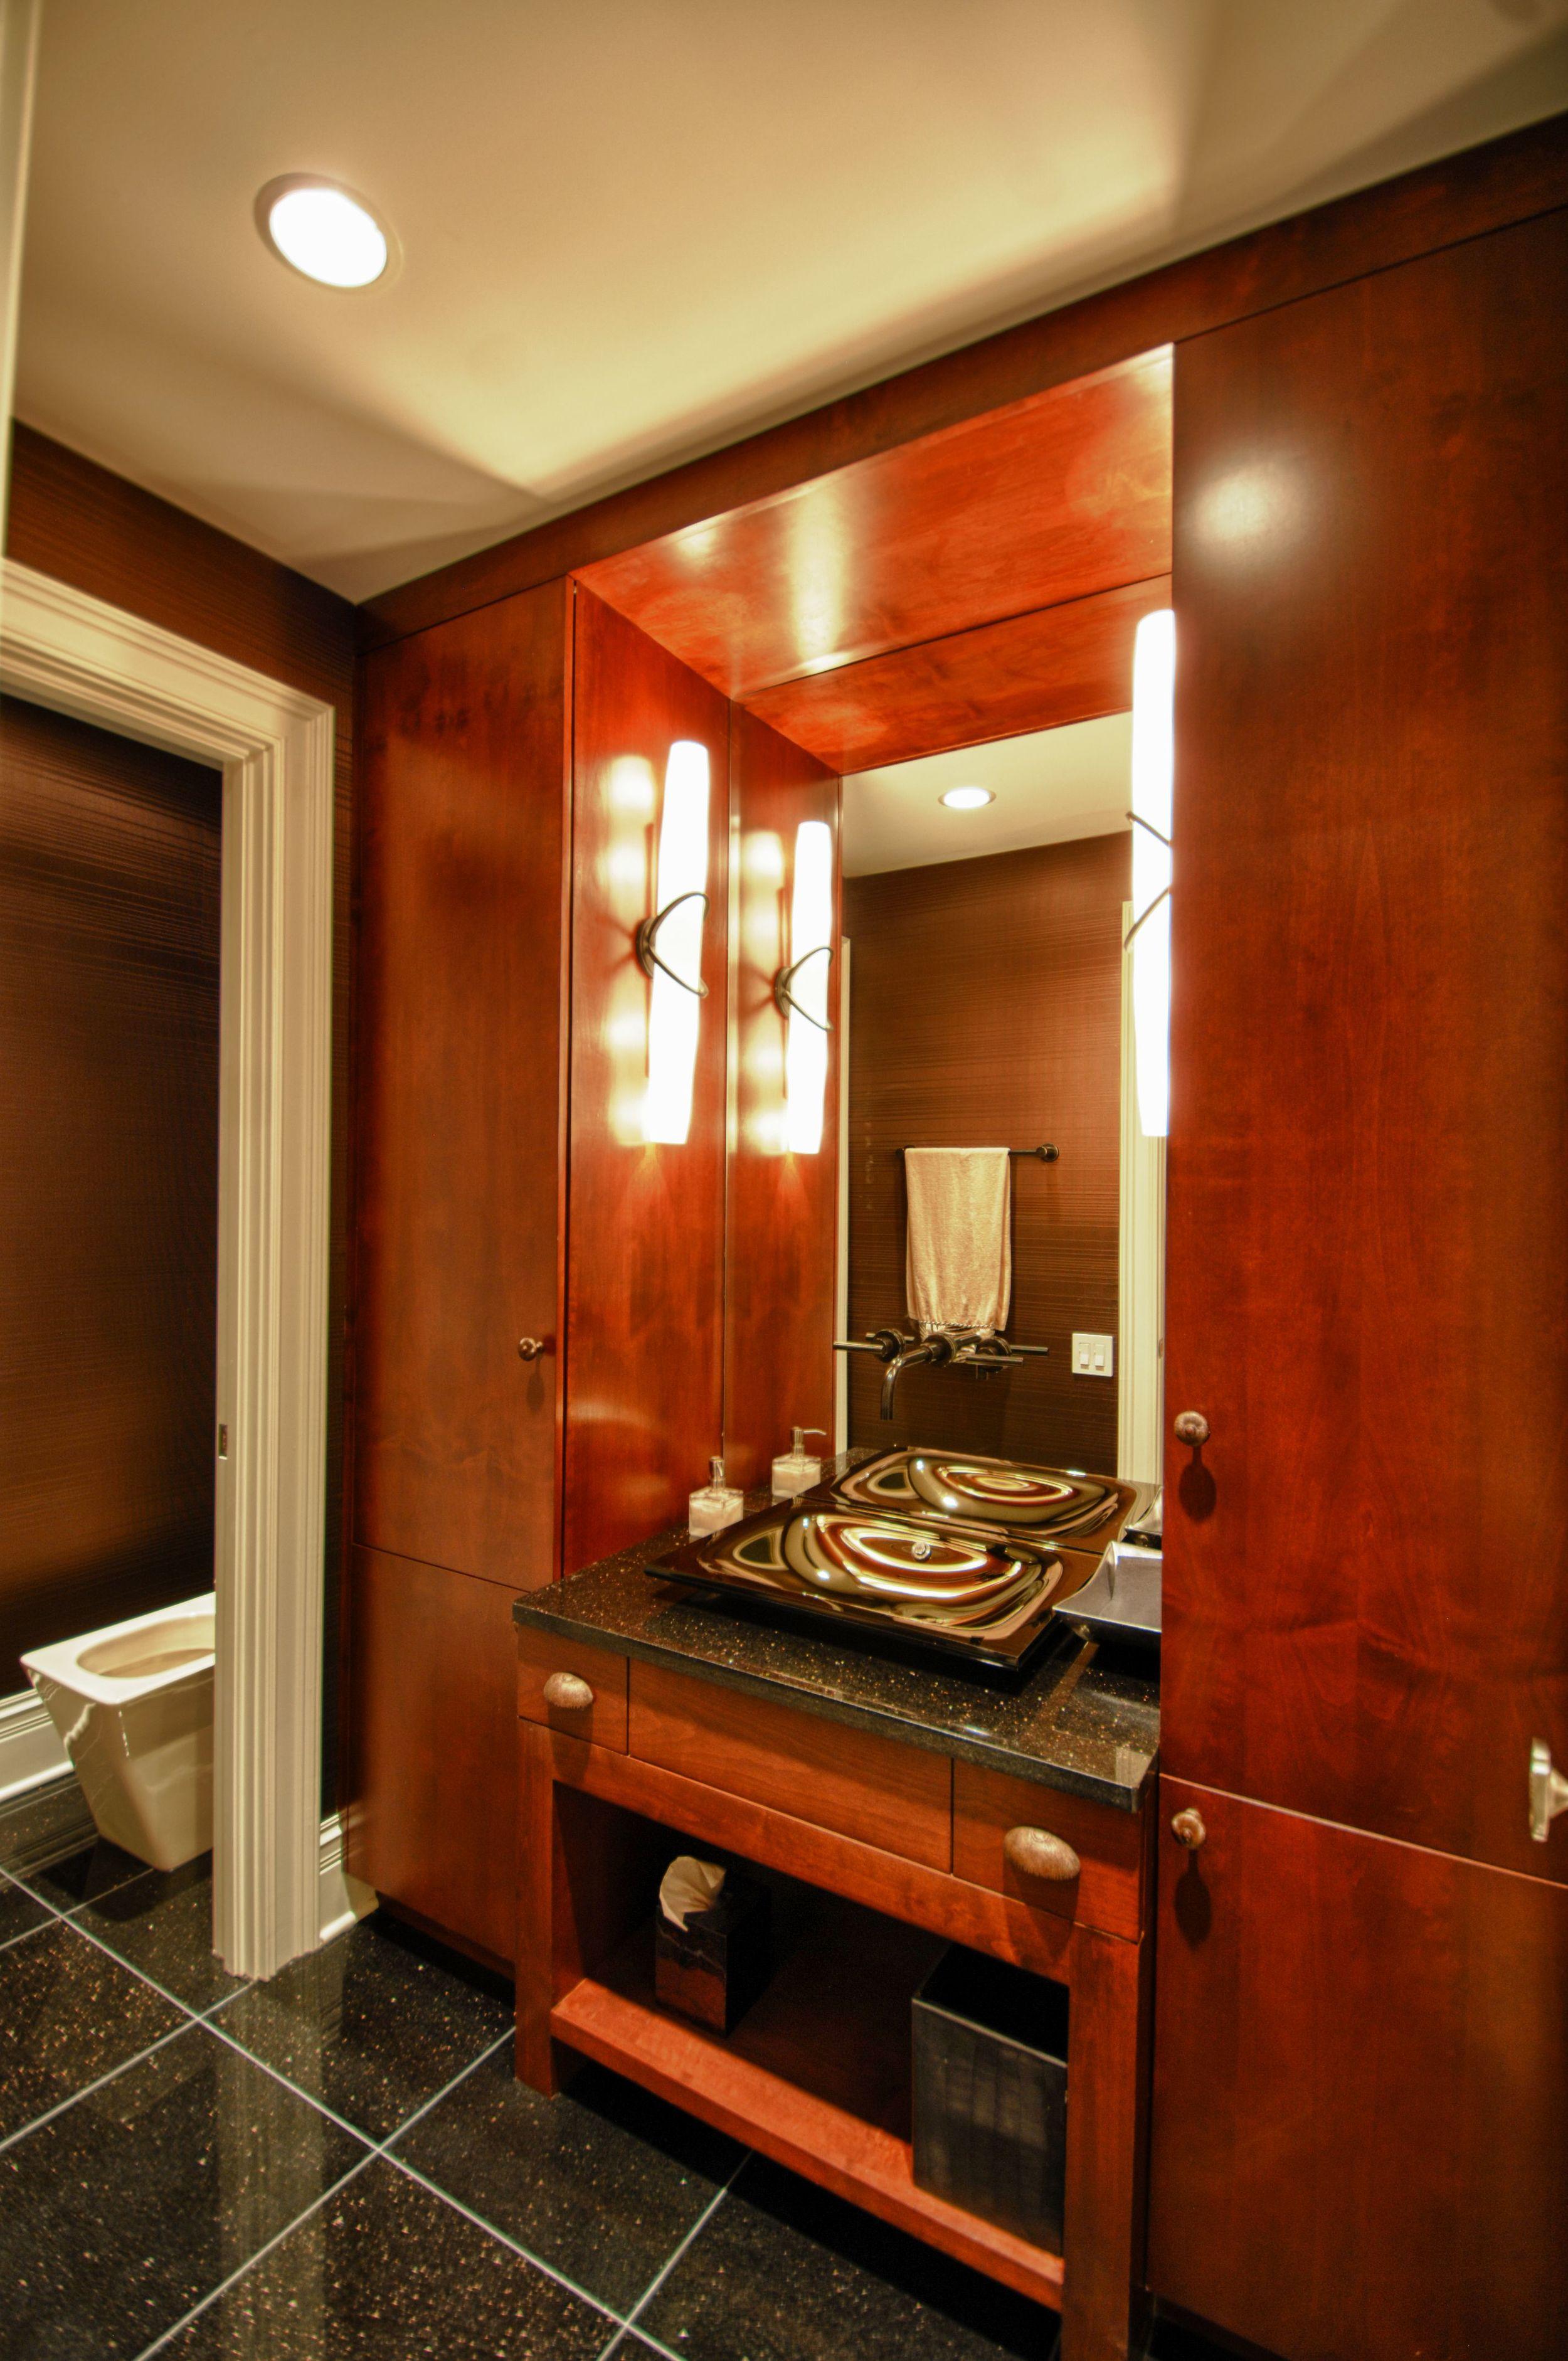 Arkin Downstairs Bath 01.JPG